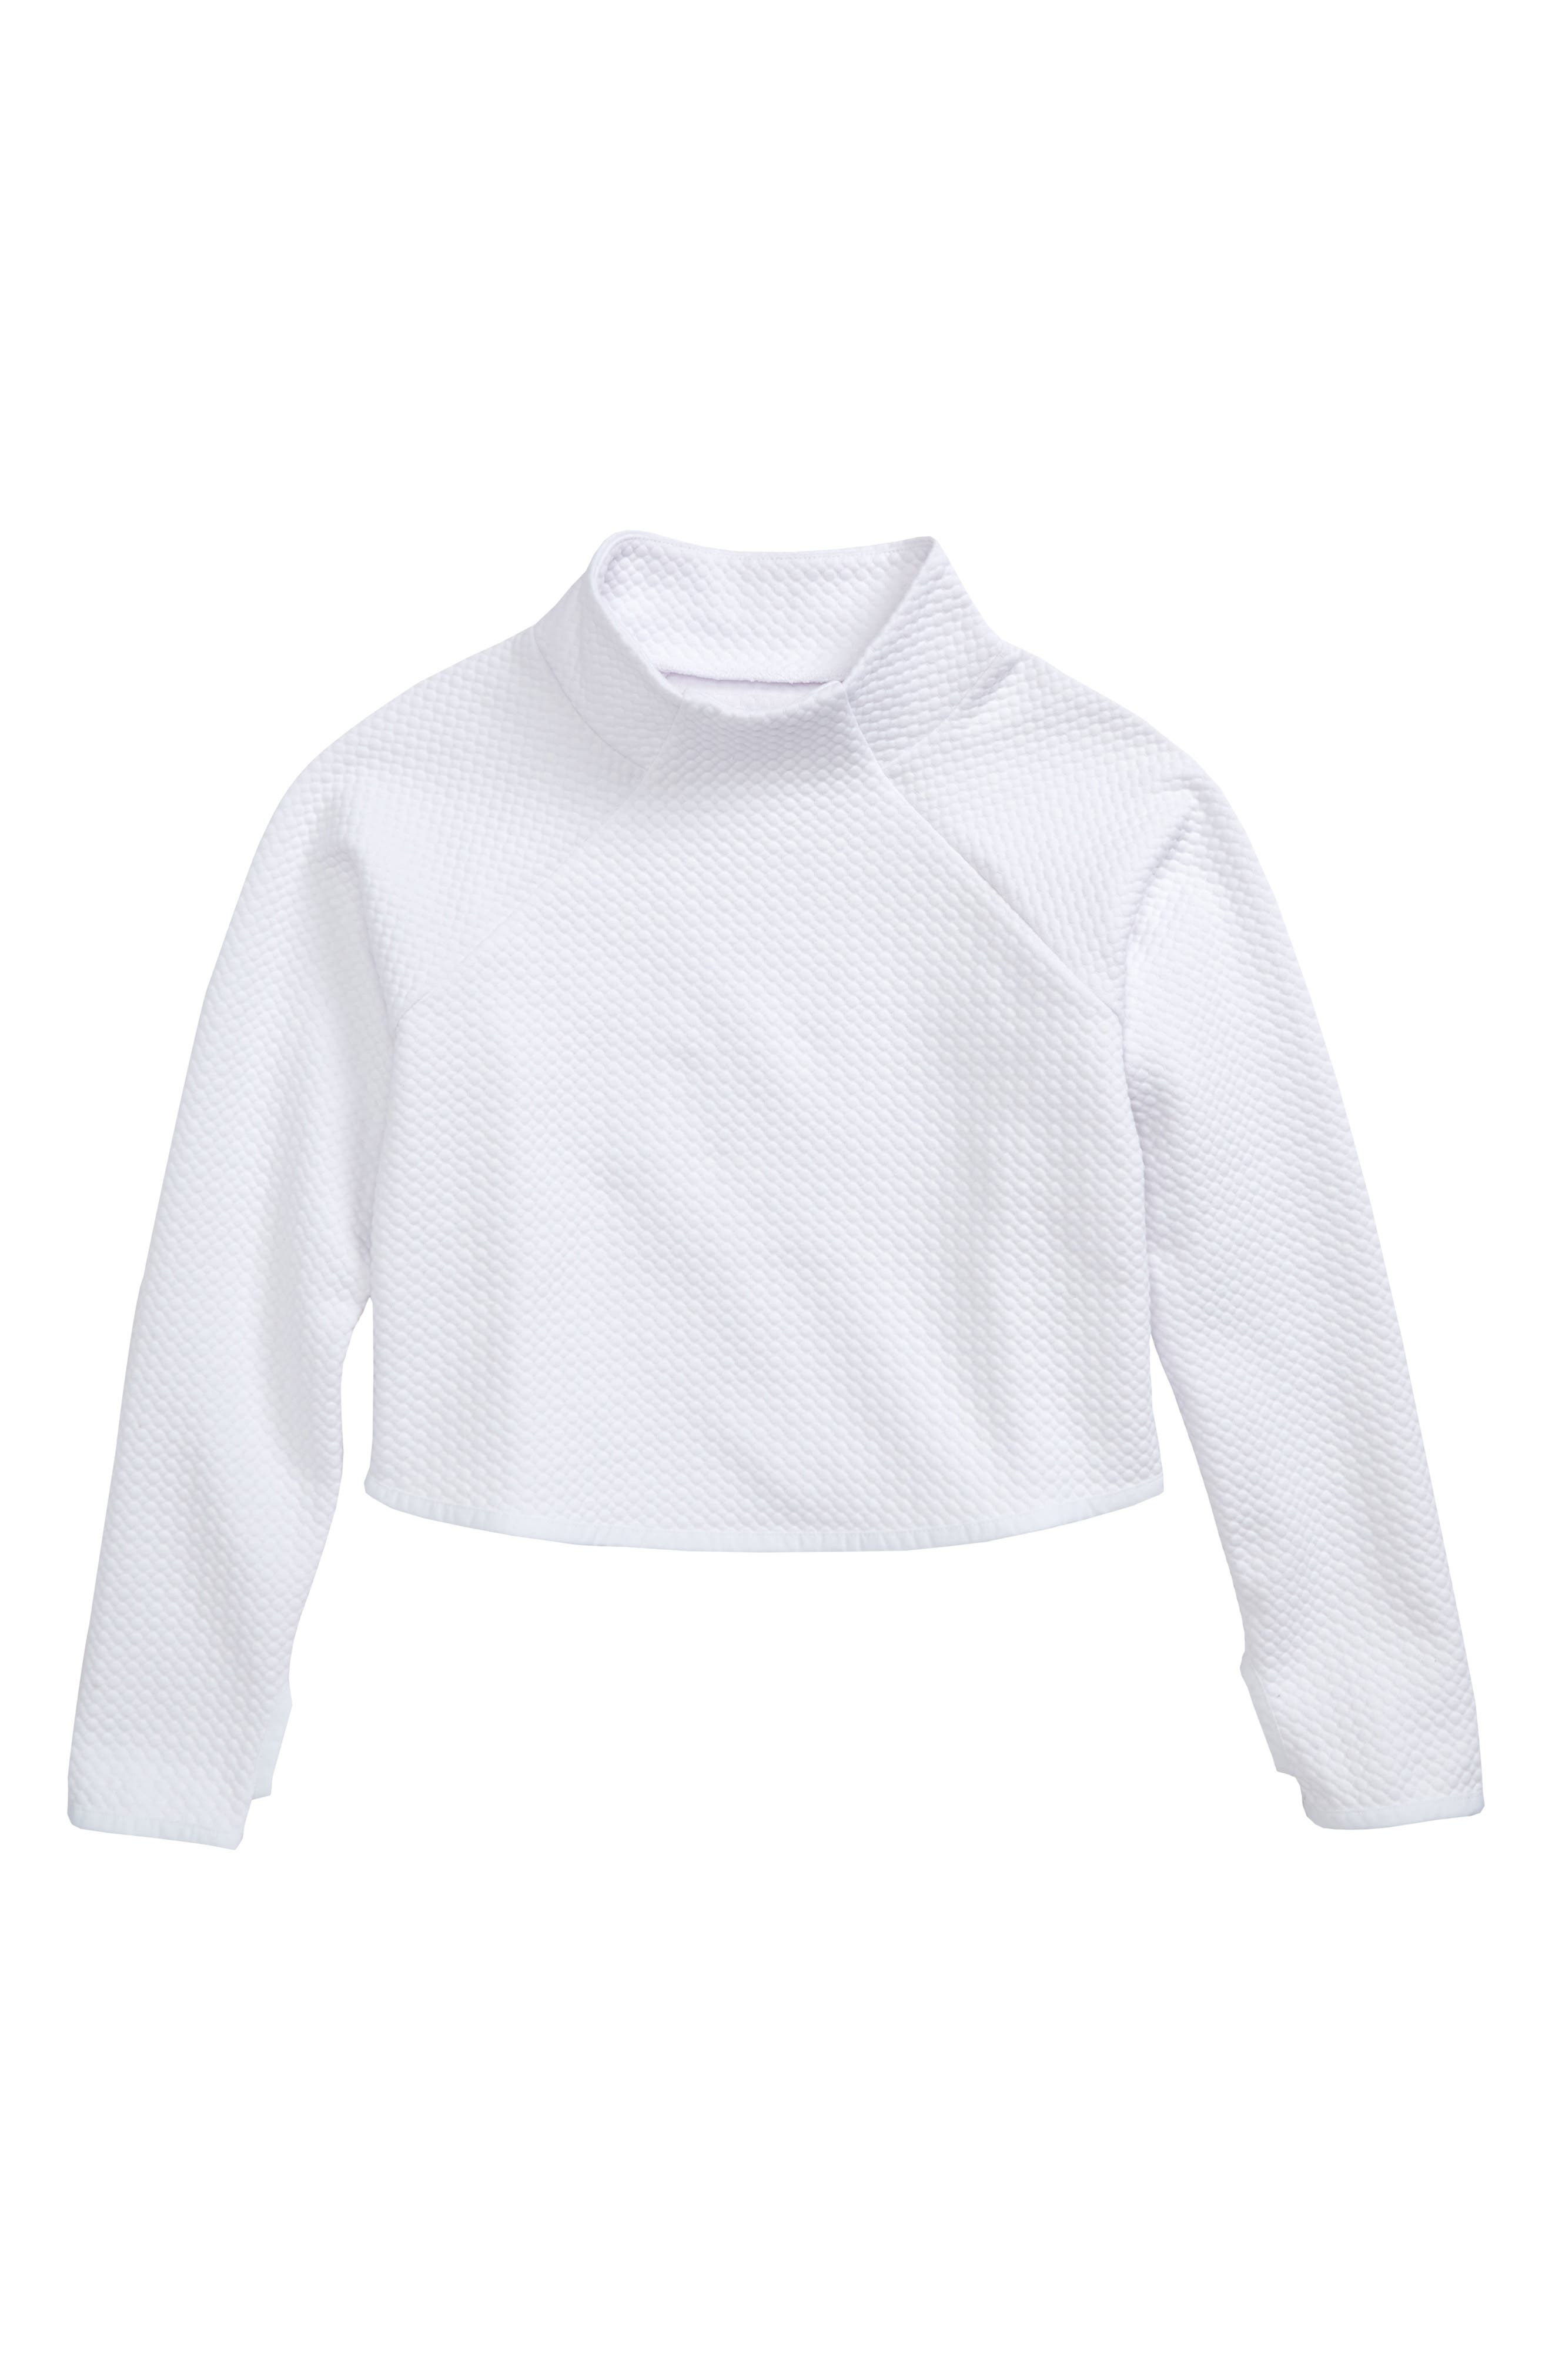 Mock Neck Scuba Sweatshirt,                         Main,                         color, White